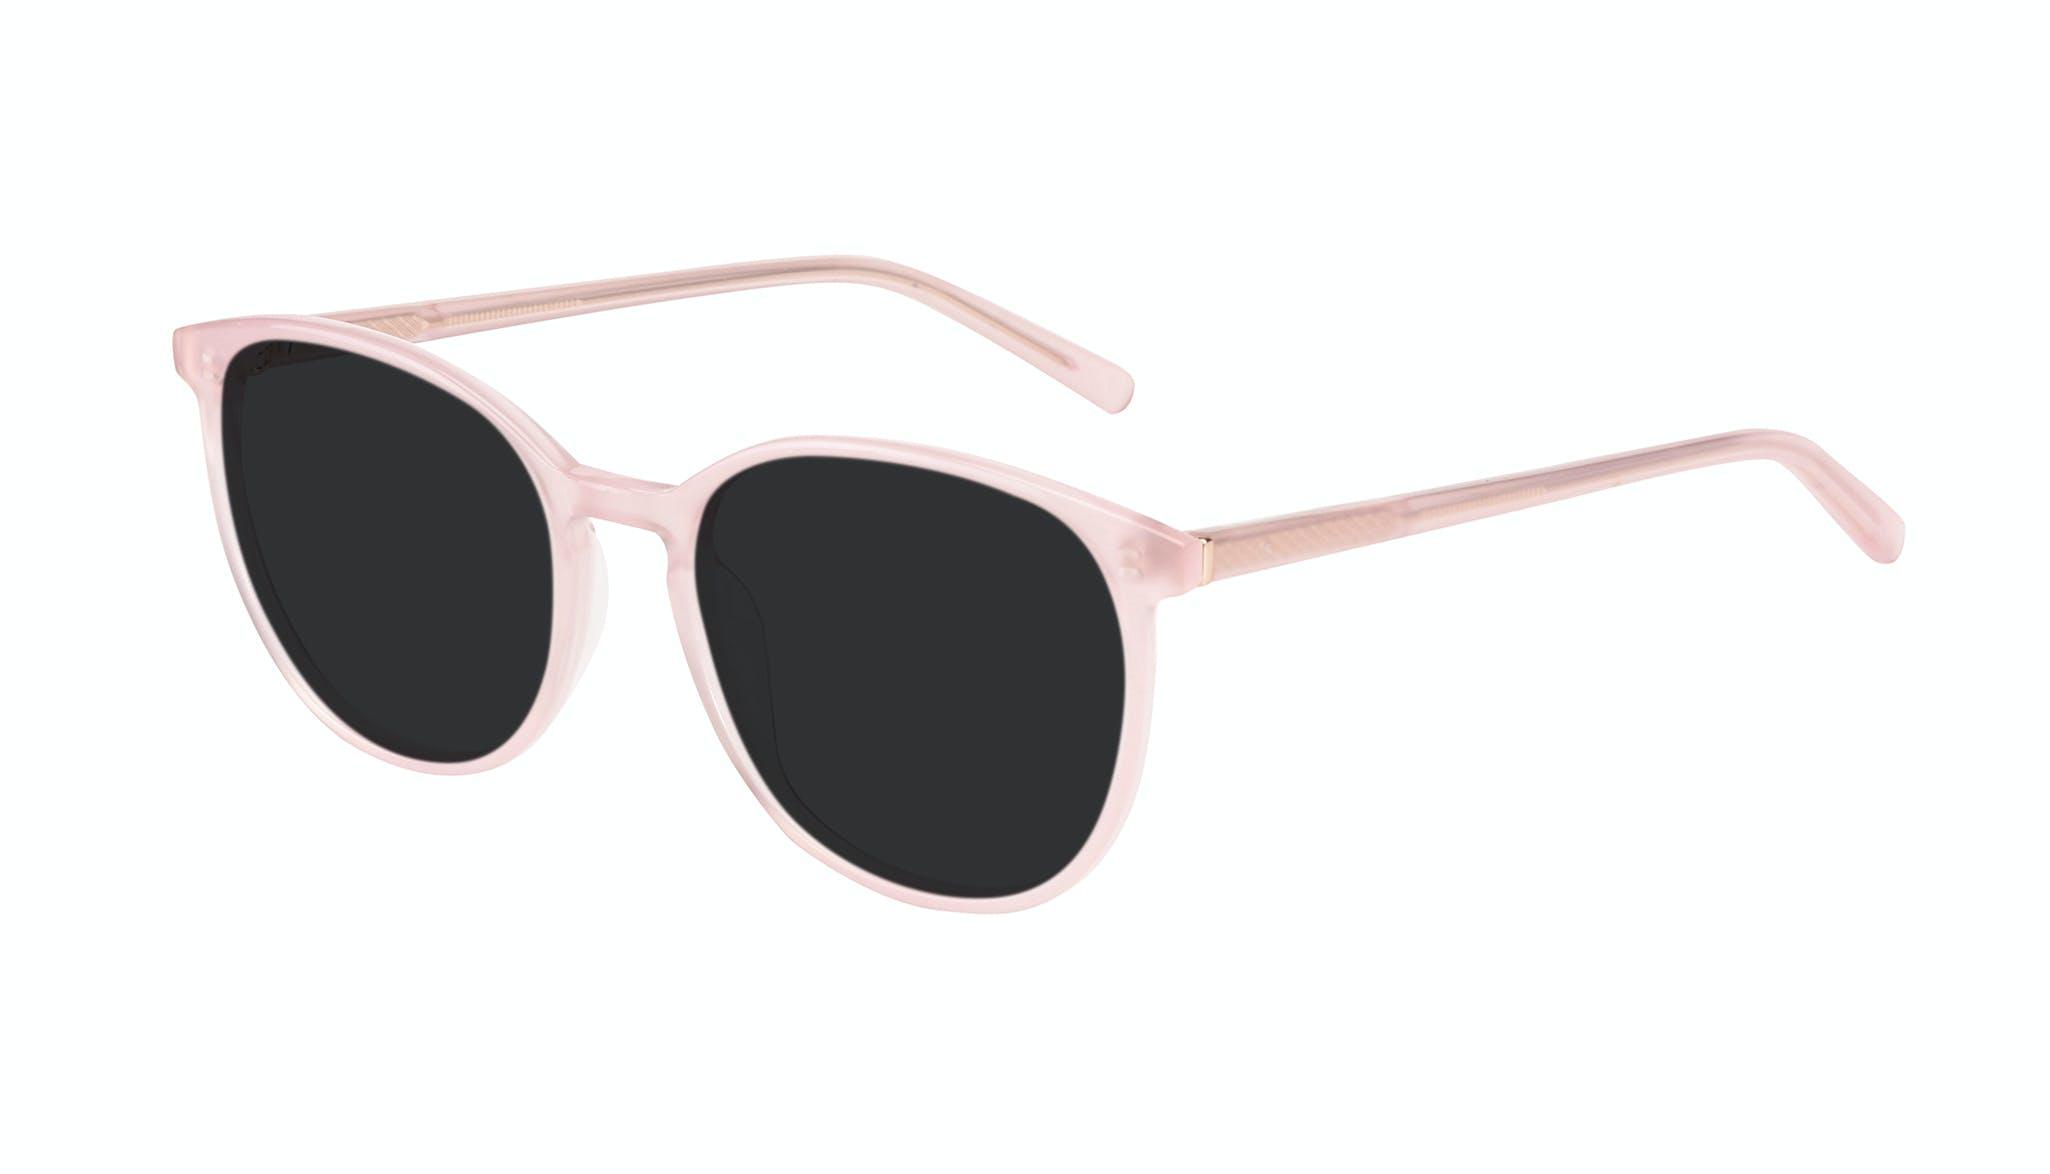 Affordable Fashion Glasses Round Sunglasses Women Femme Libre Mila Tilt